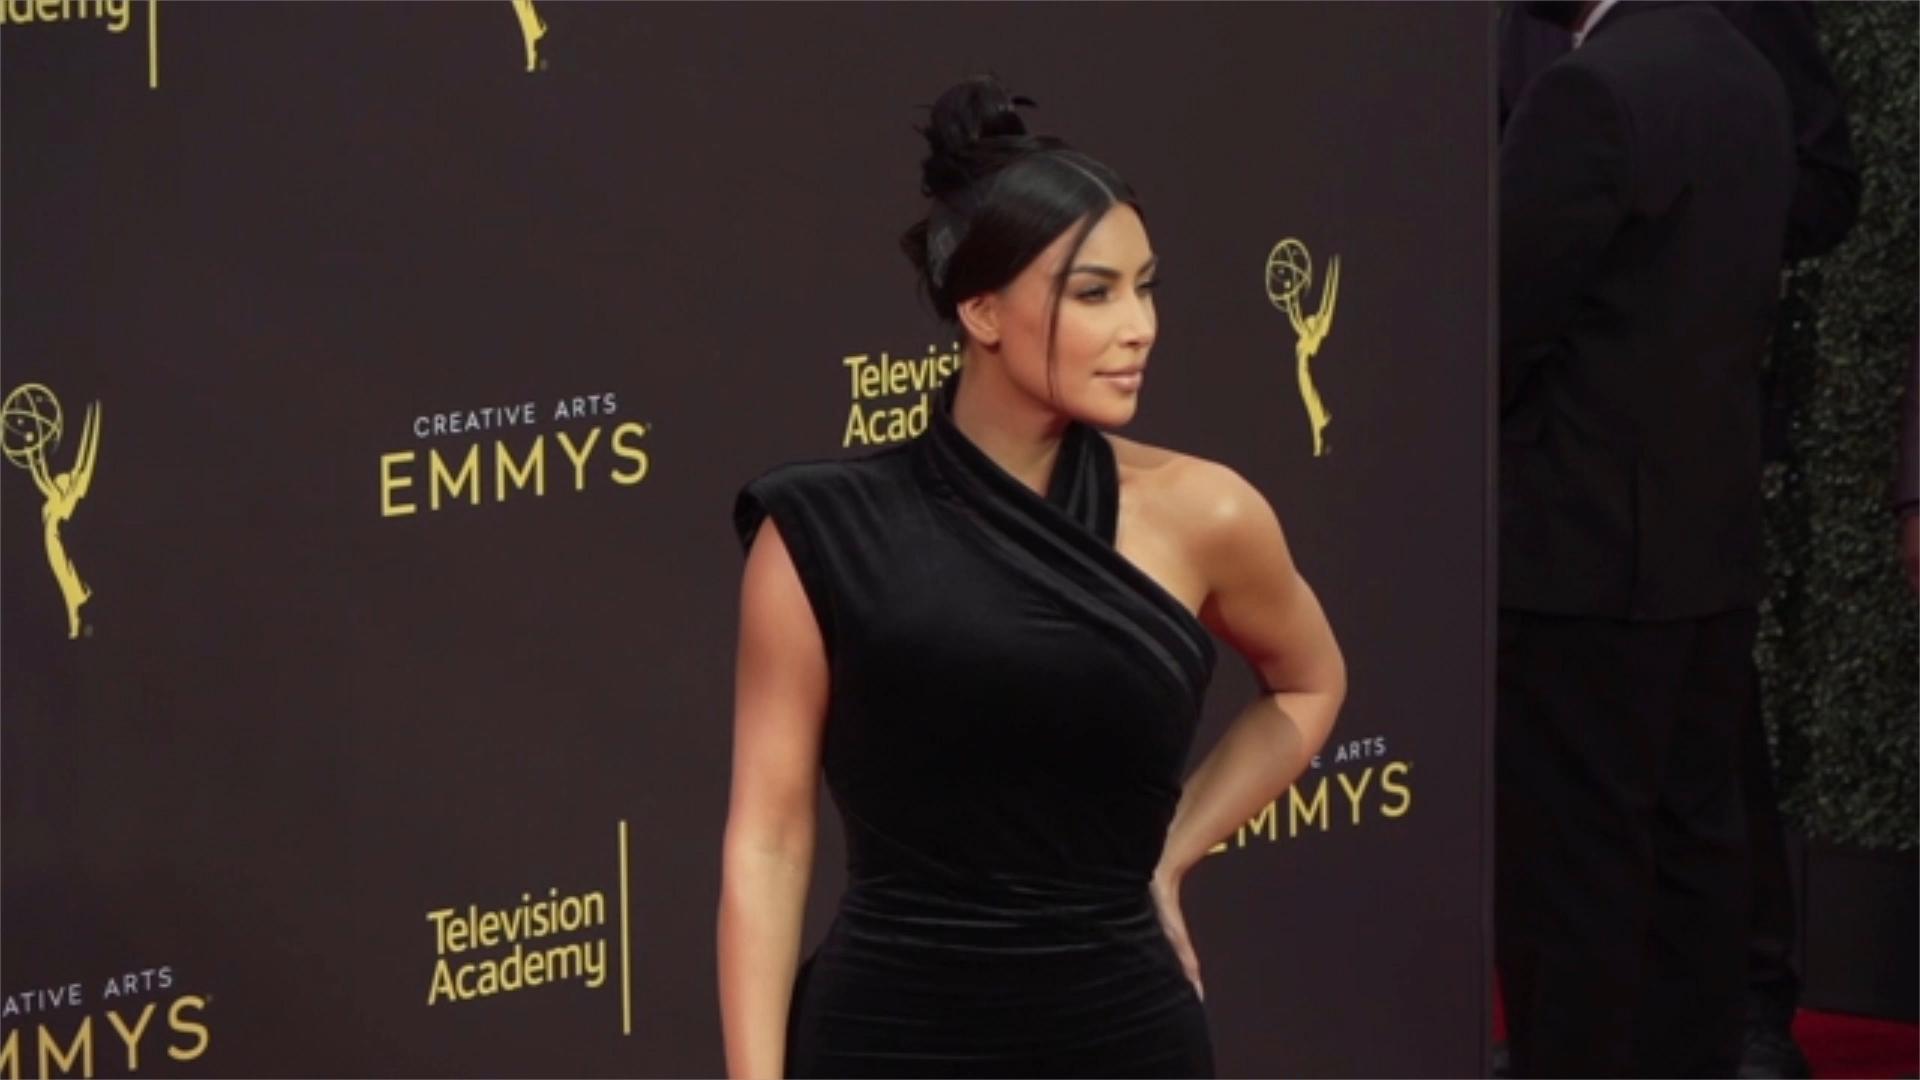 Kim Kardashian Awkwardly Interrupts Kourtney In Cringeworthy Interview